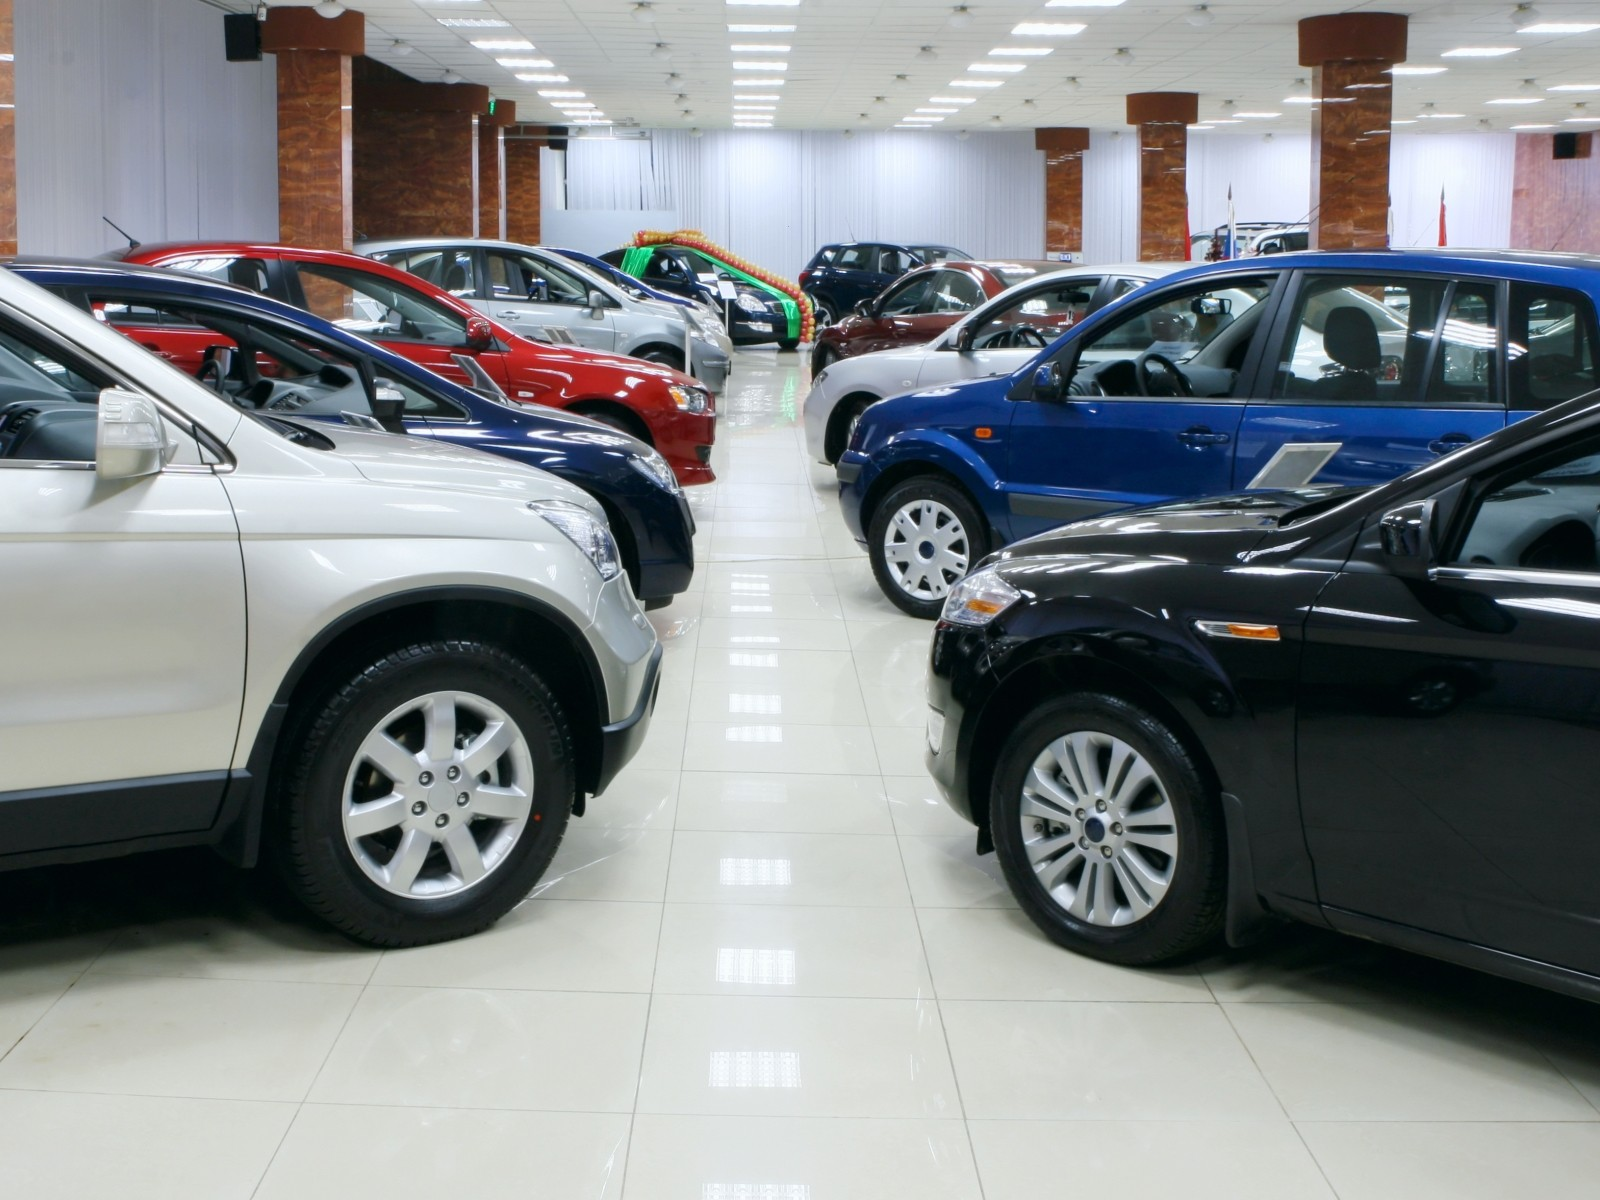 Автосалоны рейтинг москва авто с пробегом автосалон москва кроссовер продажа